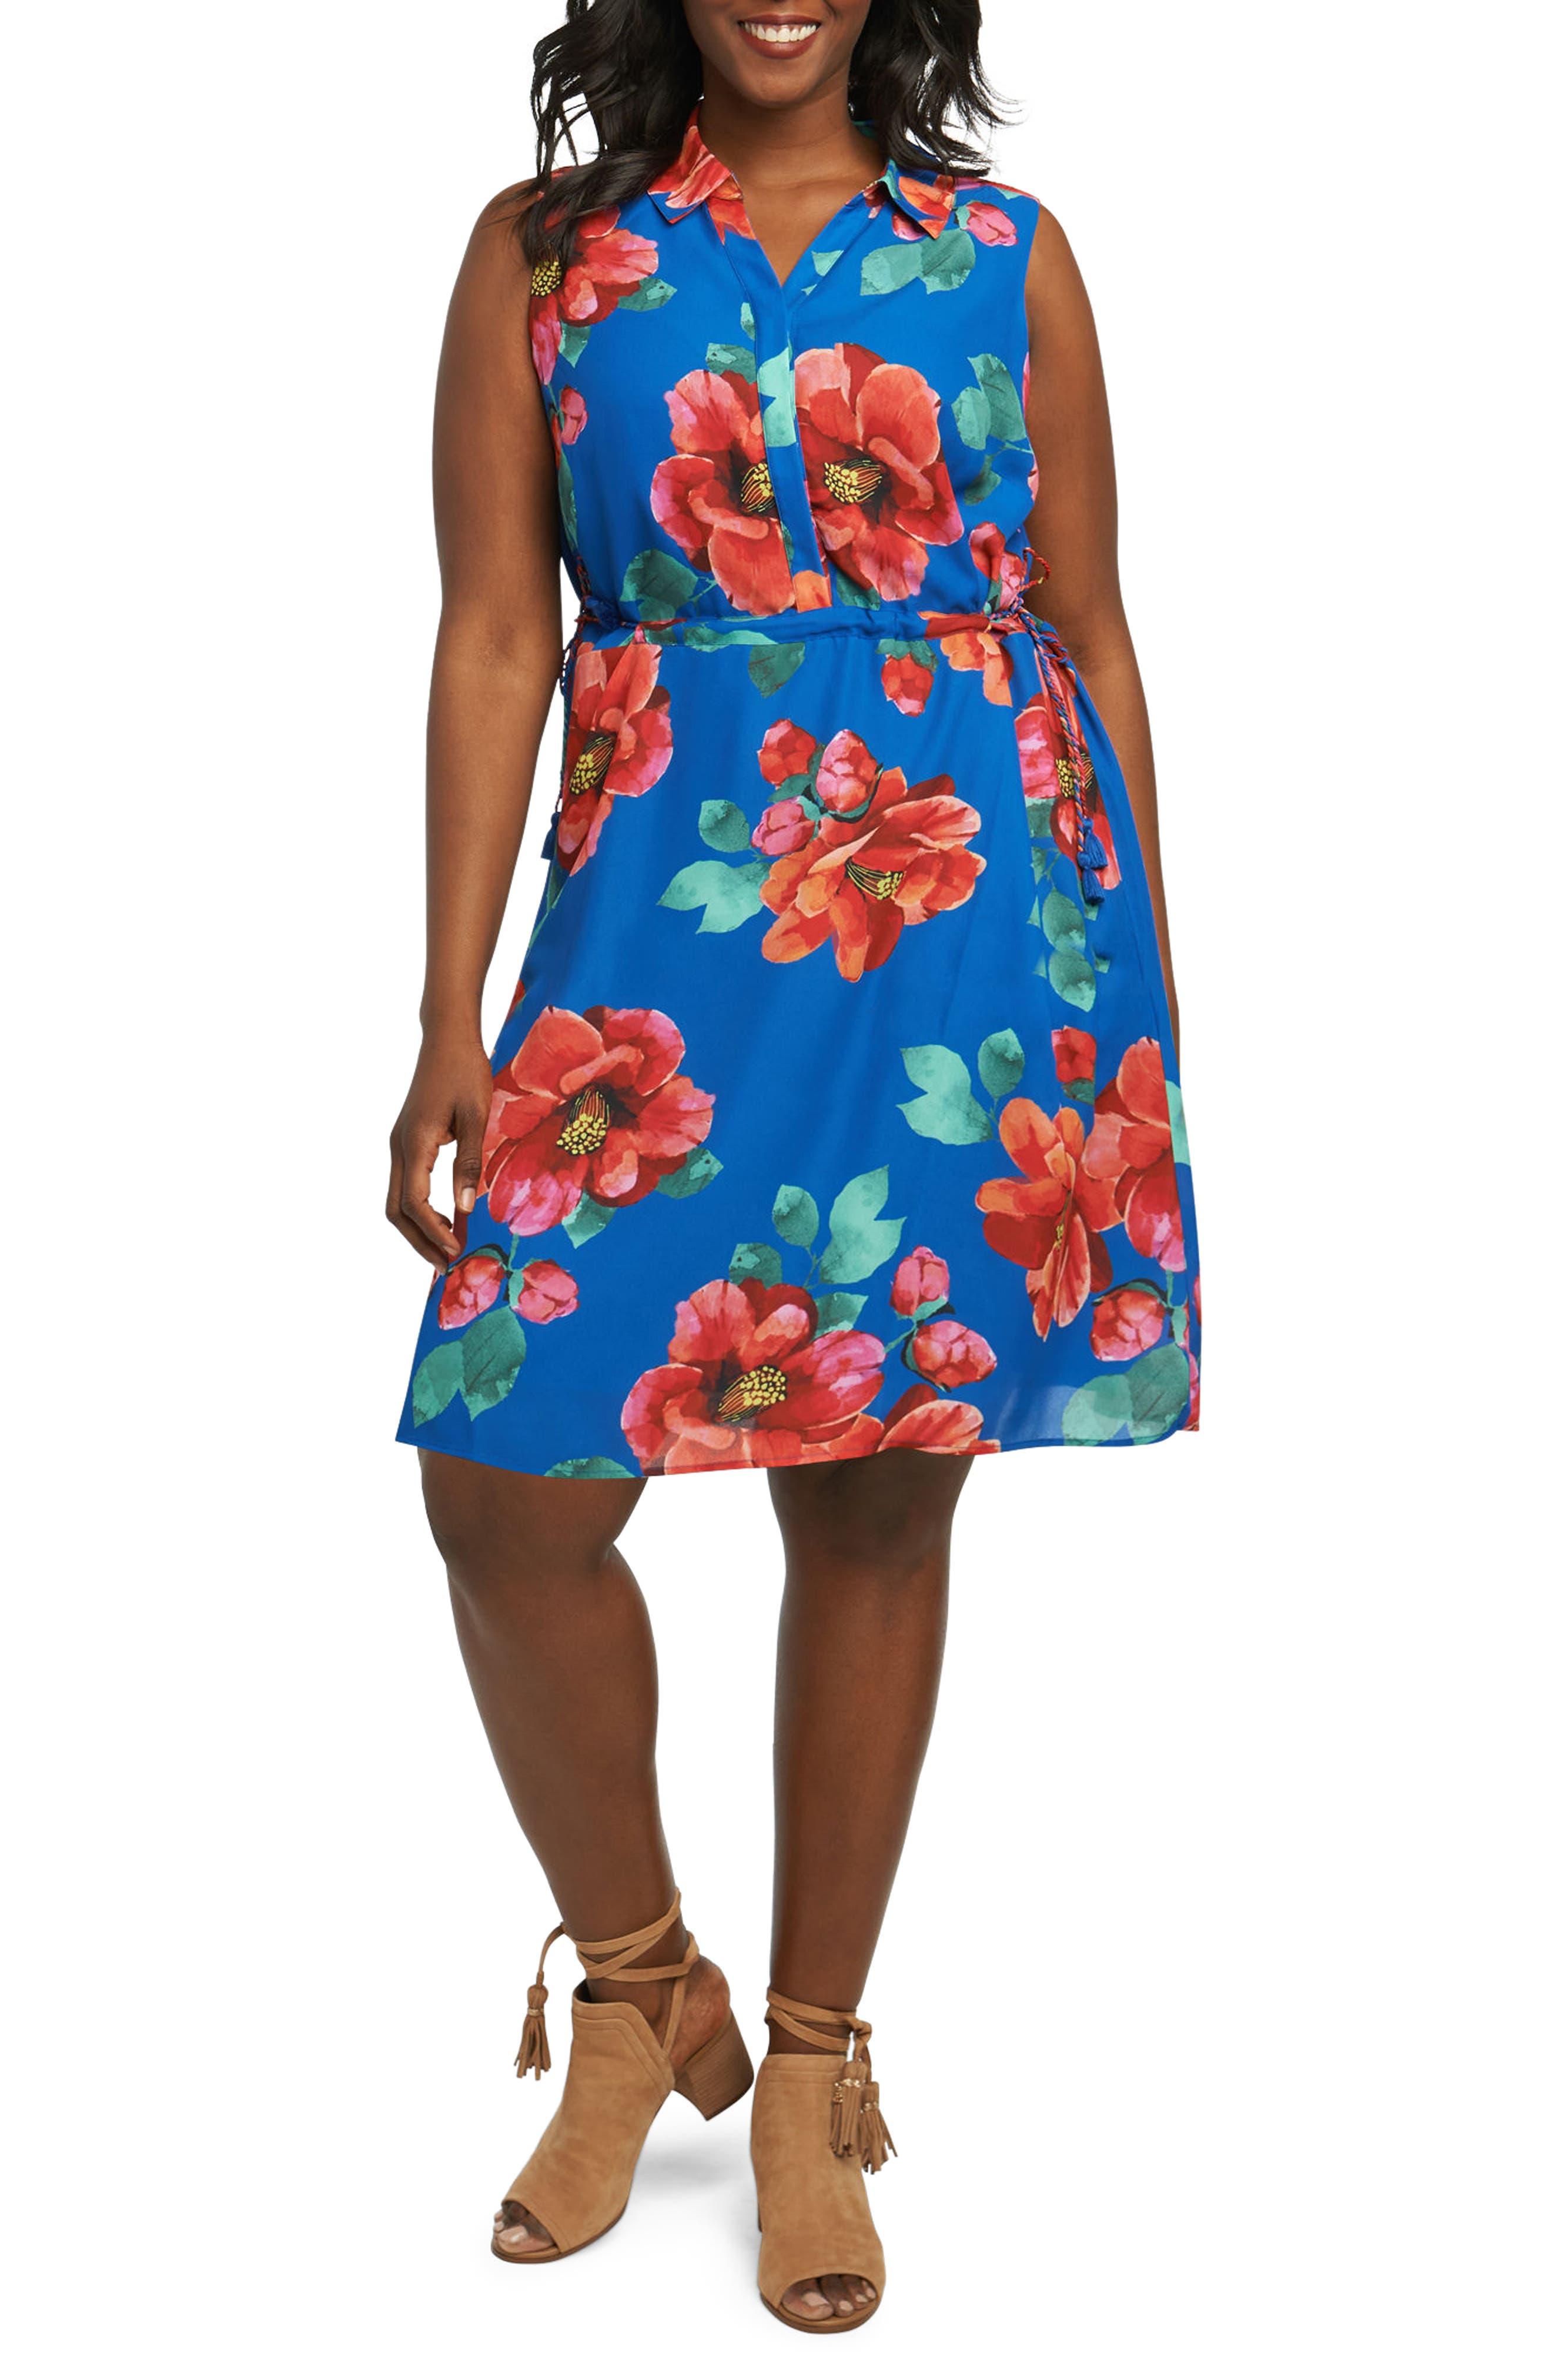 Adessia Hibiscus Floral Tassel Tie Dress,                             Main thumbnail 1, color,                             MULTI